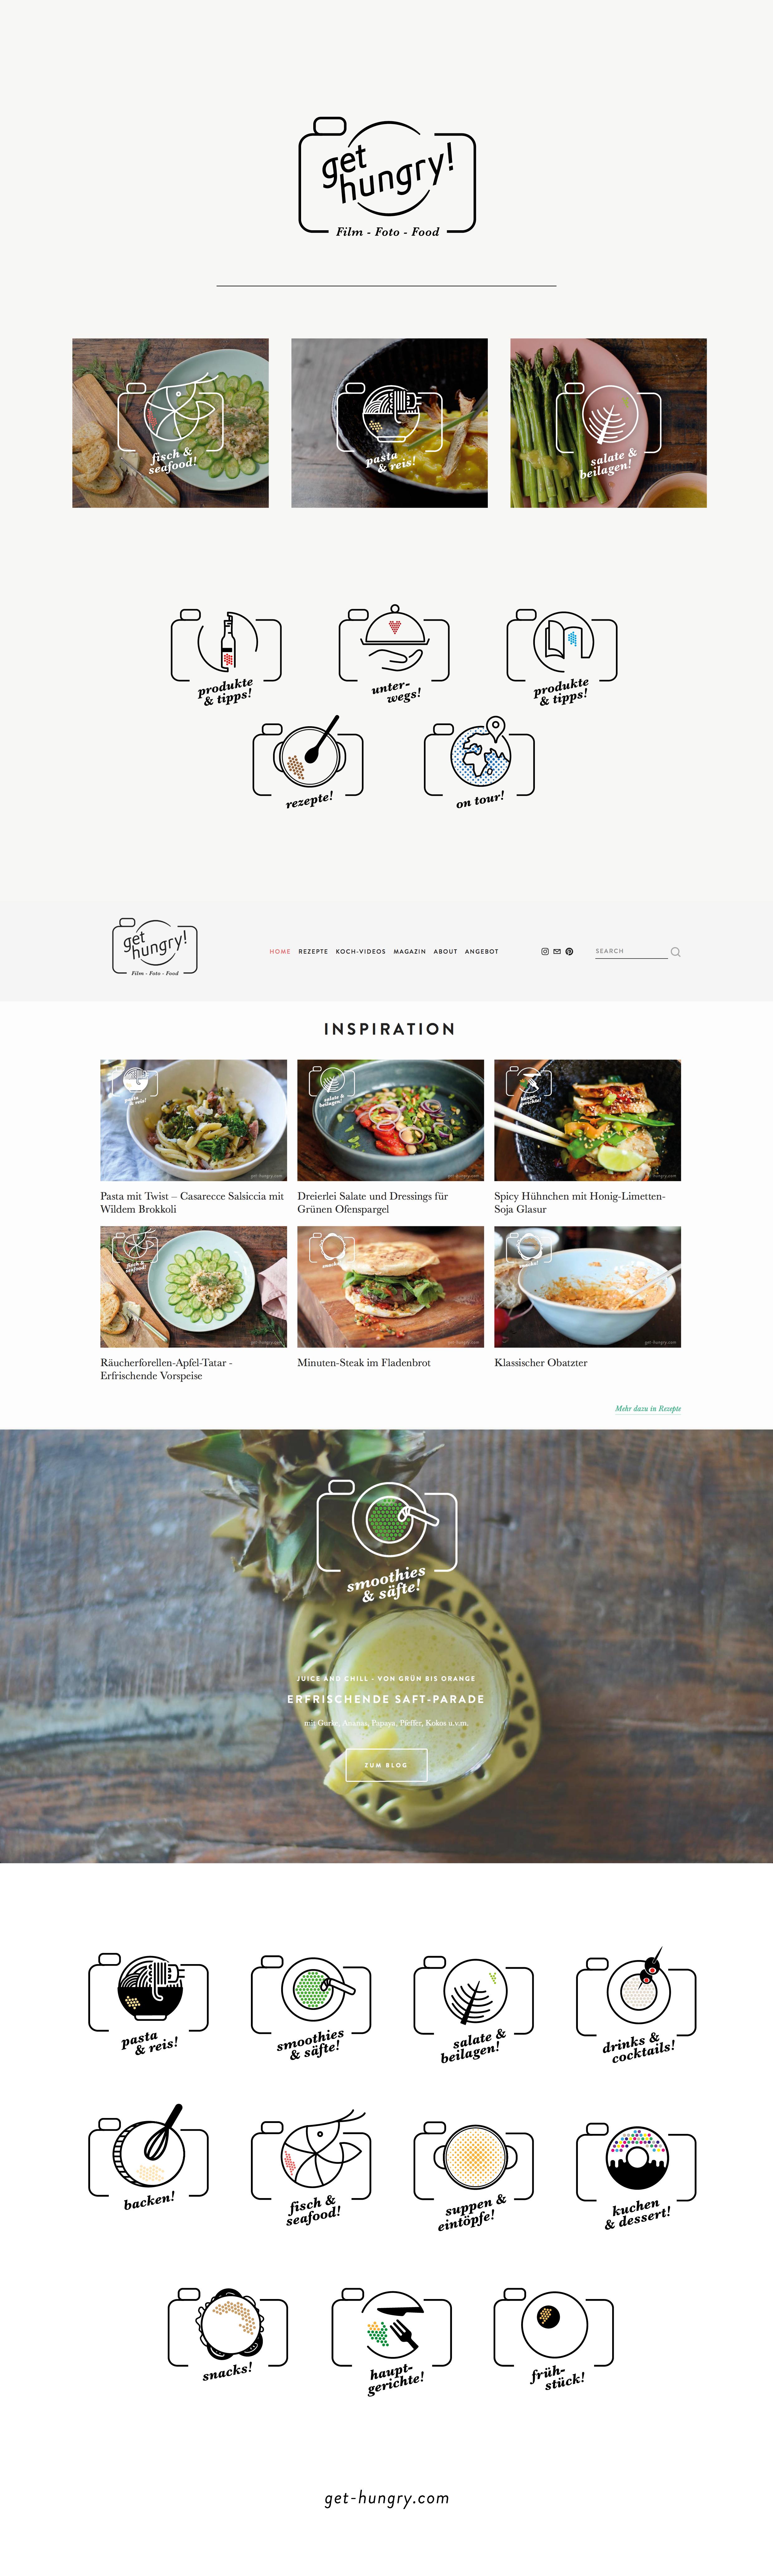 Get-hungry_portfolio.jpg